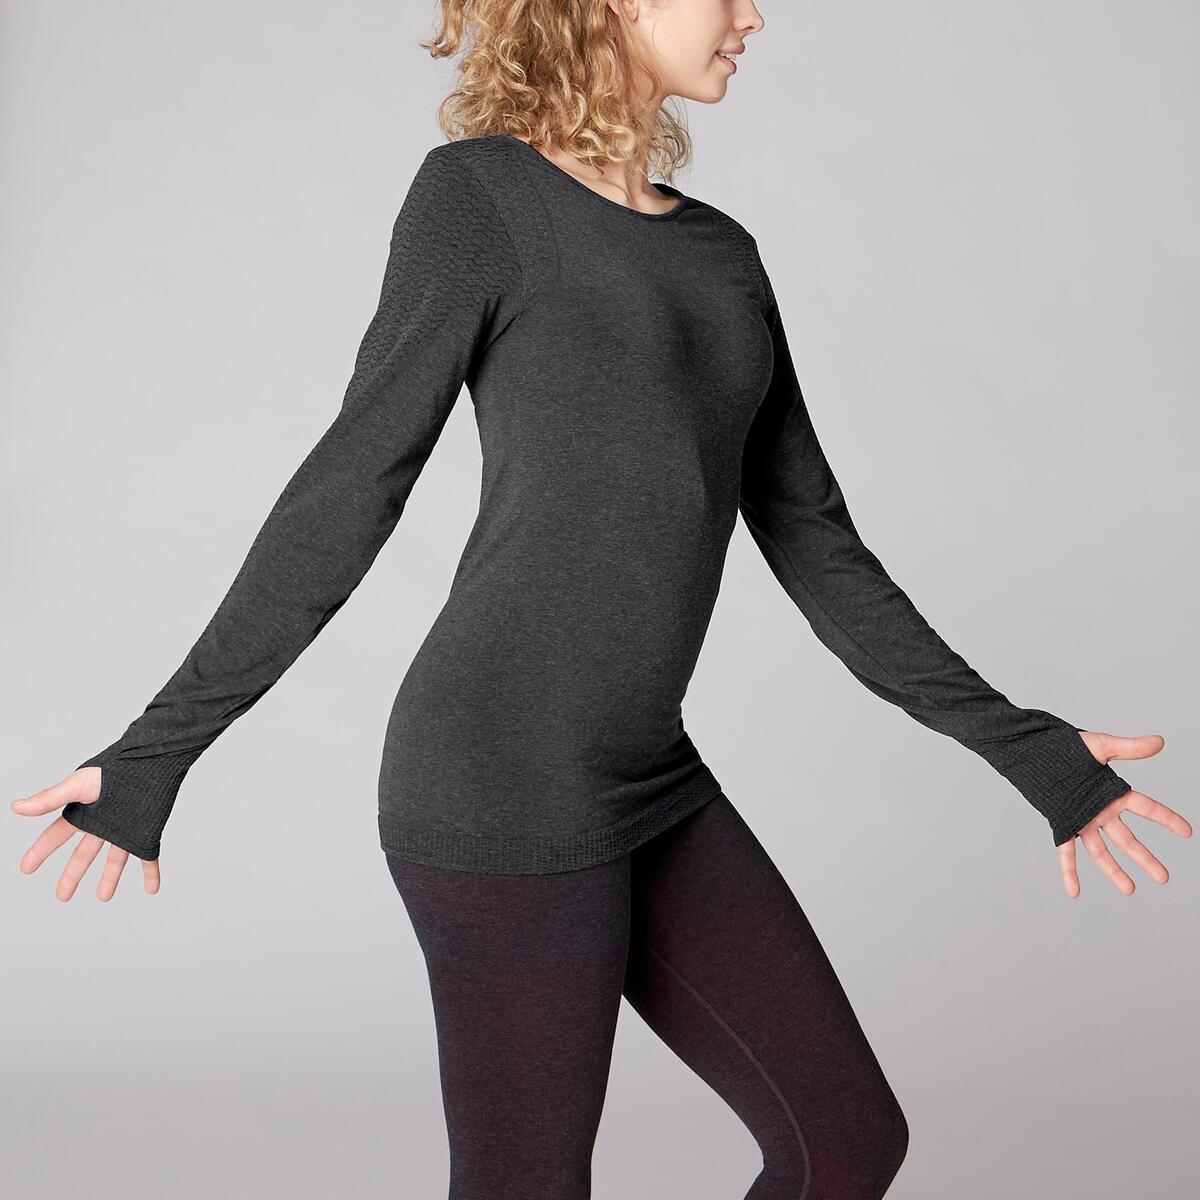 Bild 3 von Langarmshirt Yoga Damen dunkelgrau